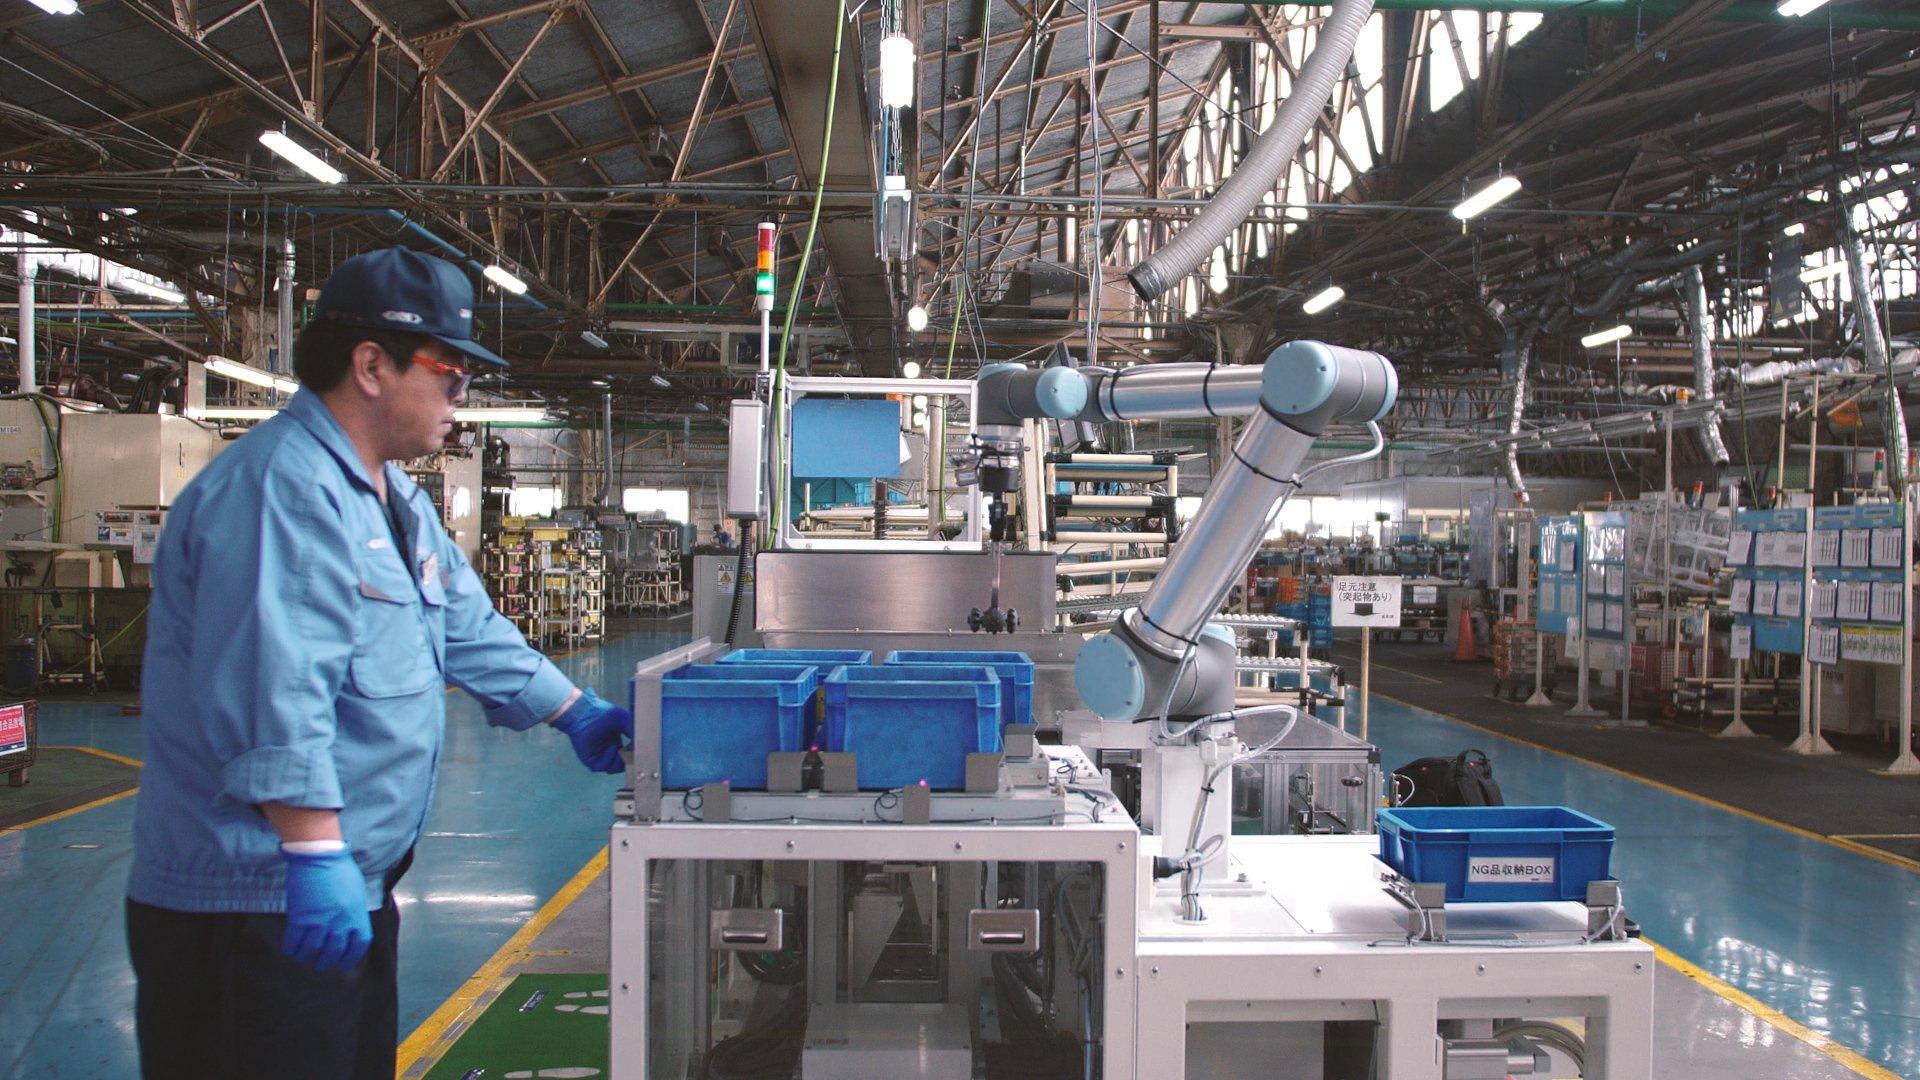 1. UR5 at the gear assembling process